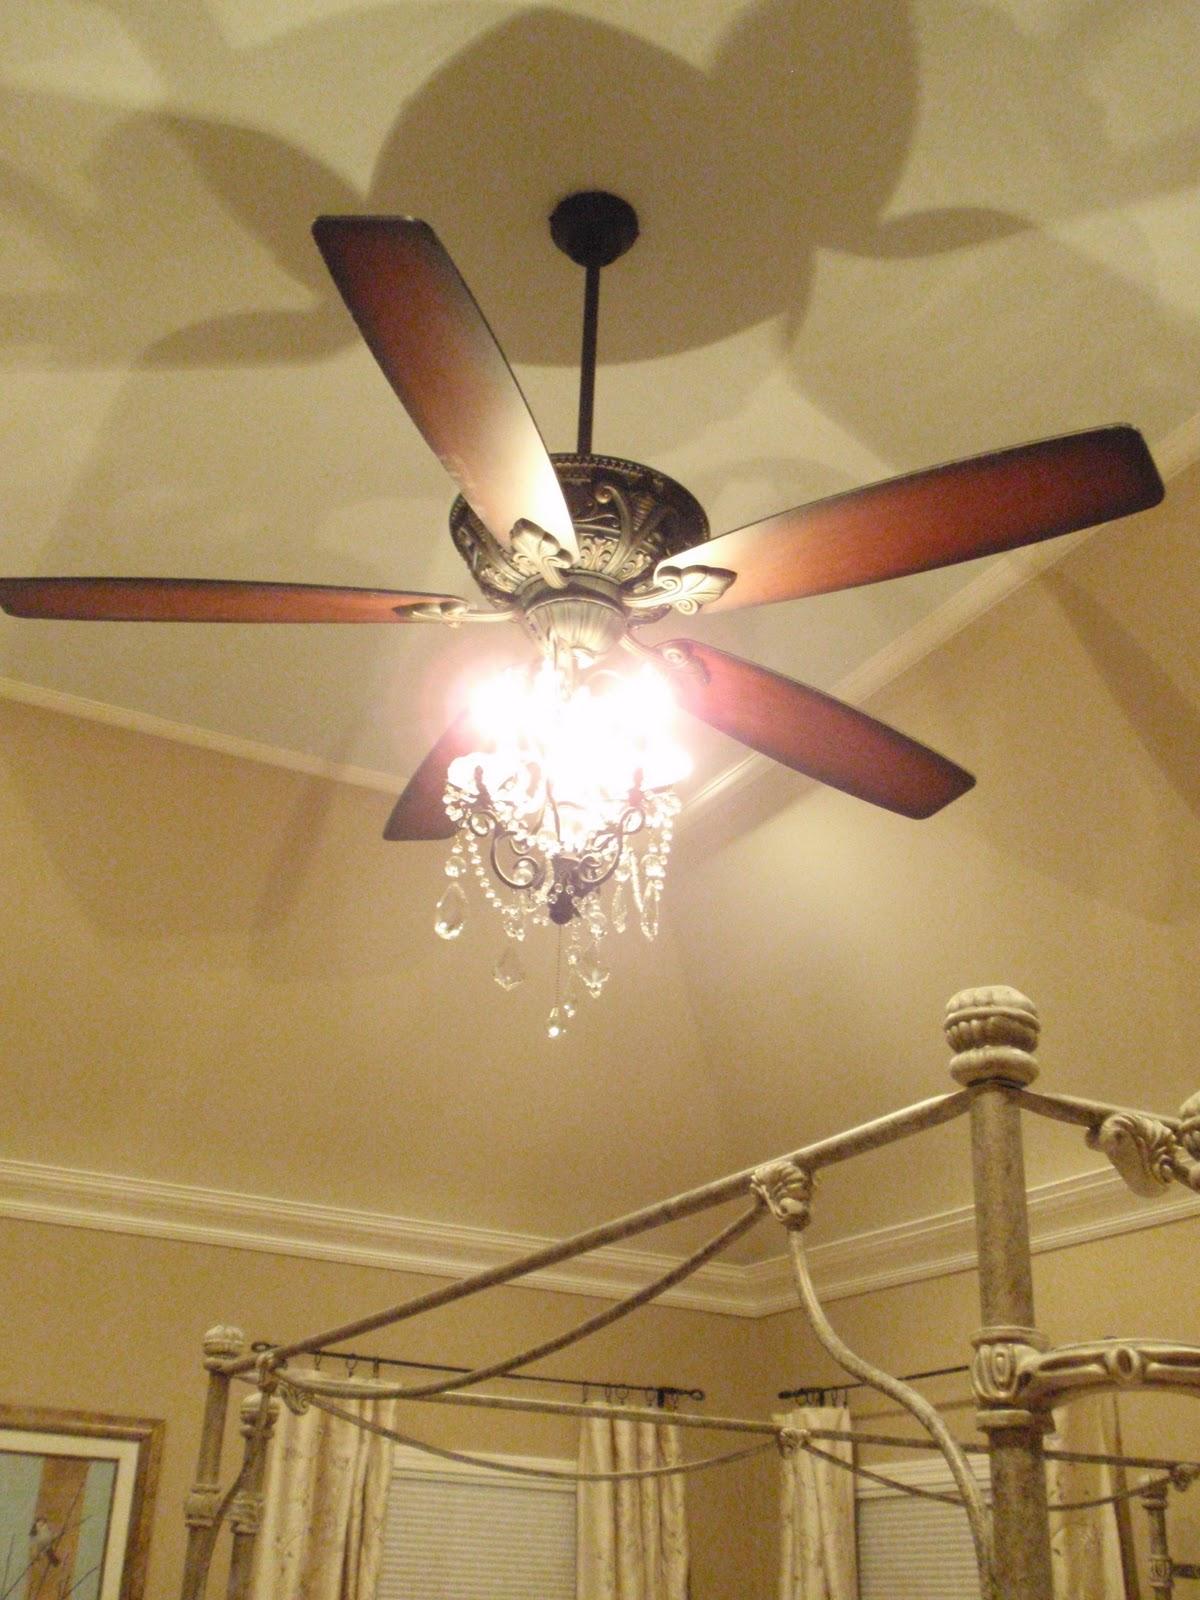 Diy by design my favorite lighting a chandelier for Ceiling fan or chandelier in master bedroom